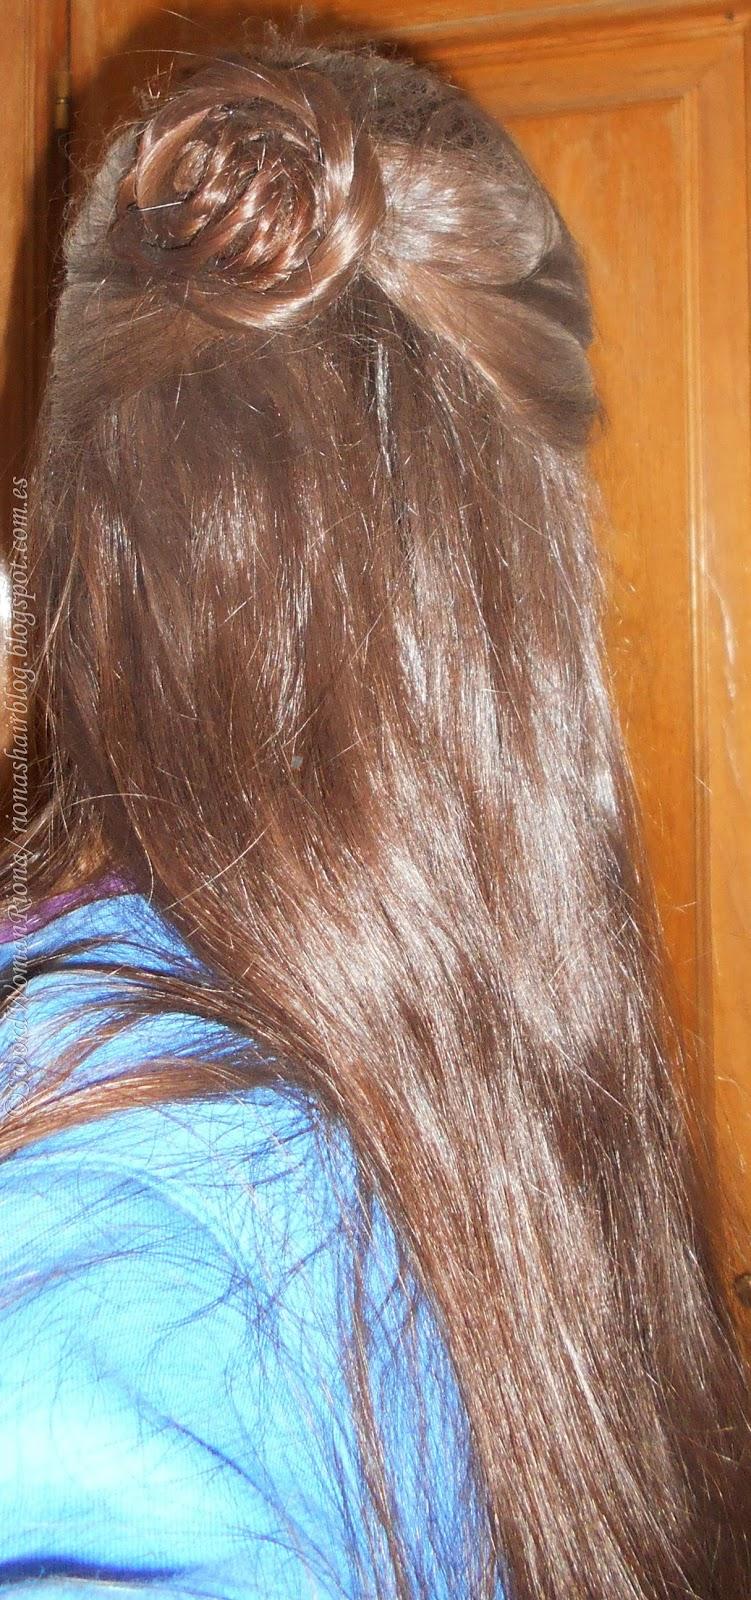 A Sword-woman's Natural Hair blog: Hairstyles - The Rose bun / Updos